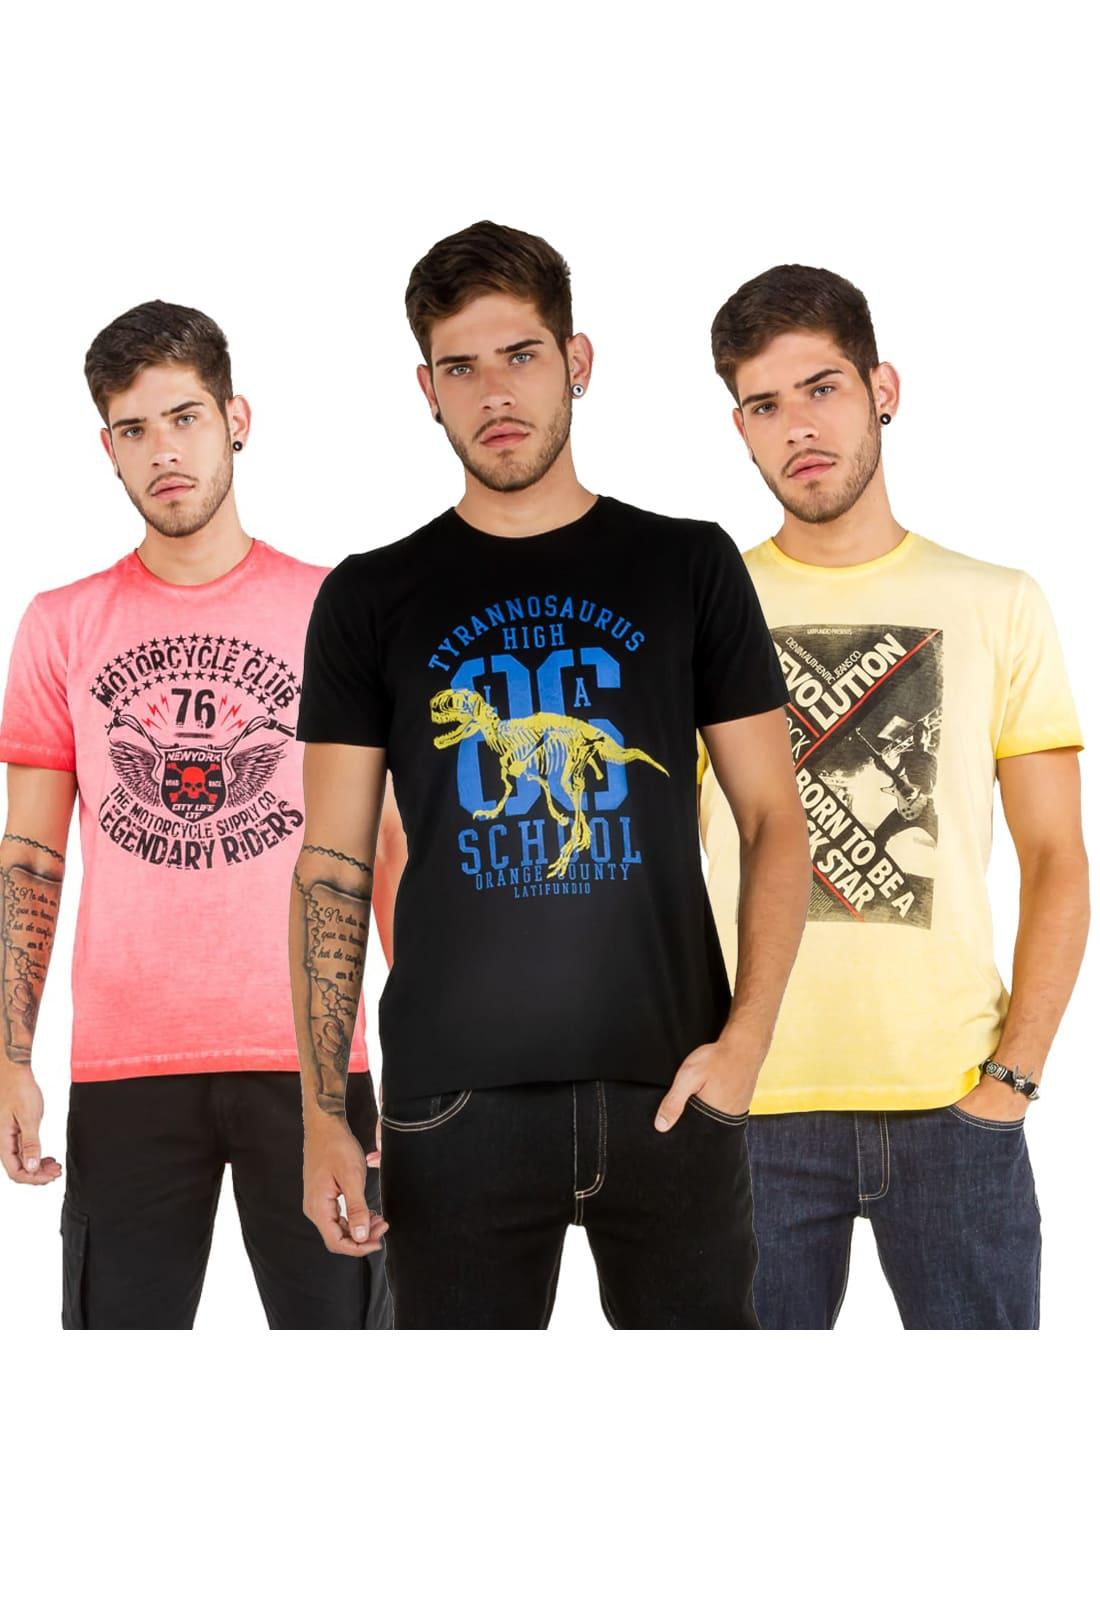 3 T-shirts Masculina - Estampa High School - Motorcycle Club - Rock Star